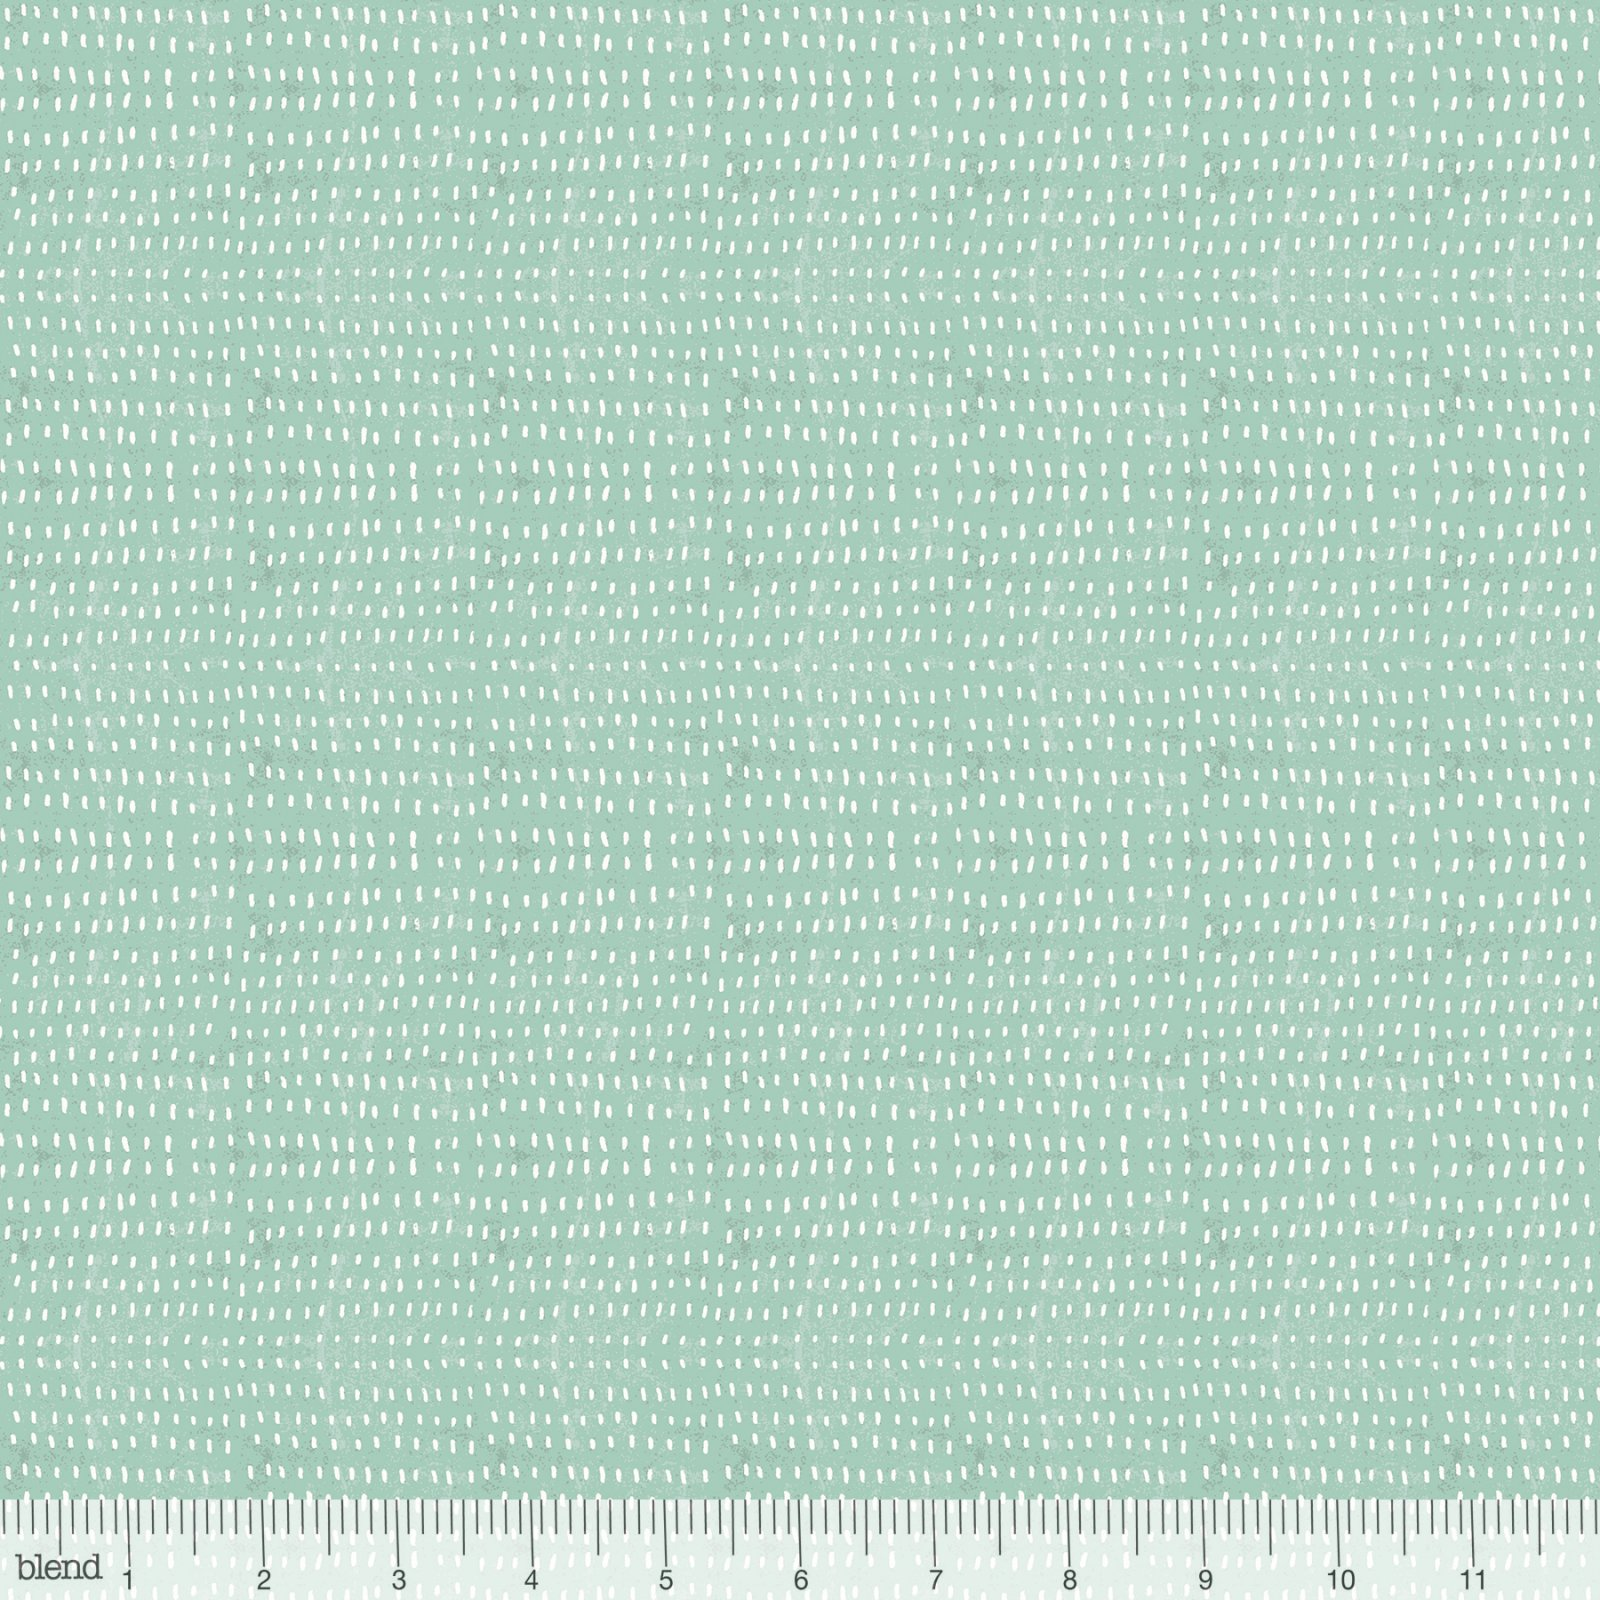 112.114.09 Ice Seeds Cori Dantini Blend Fabrics